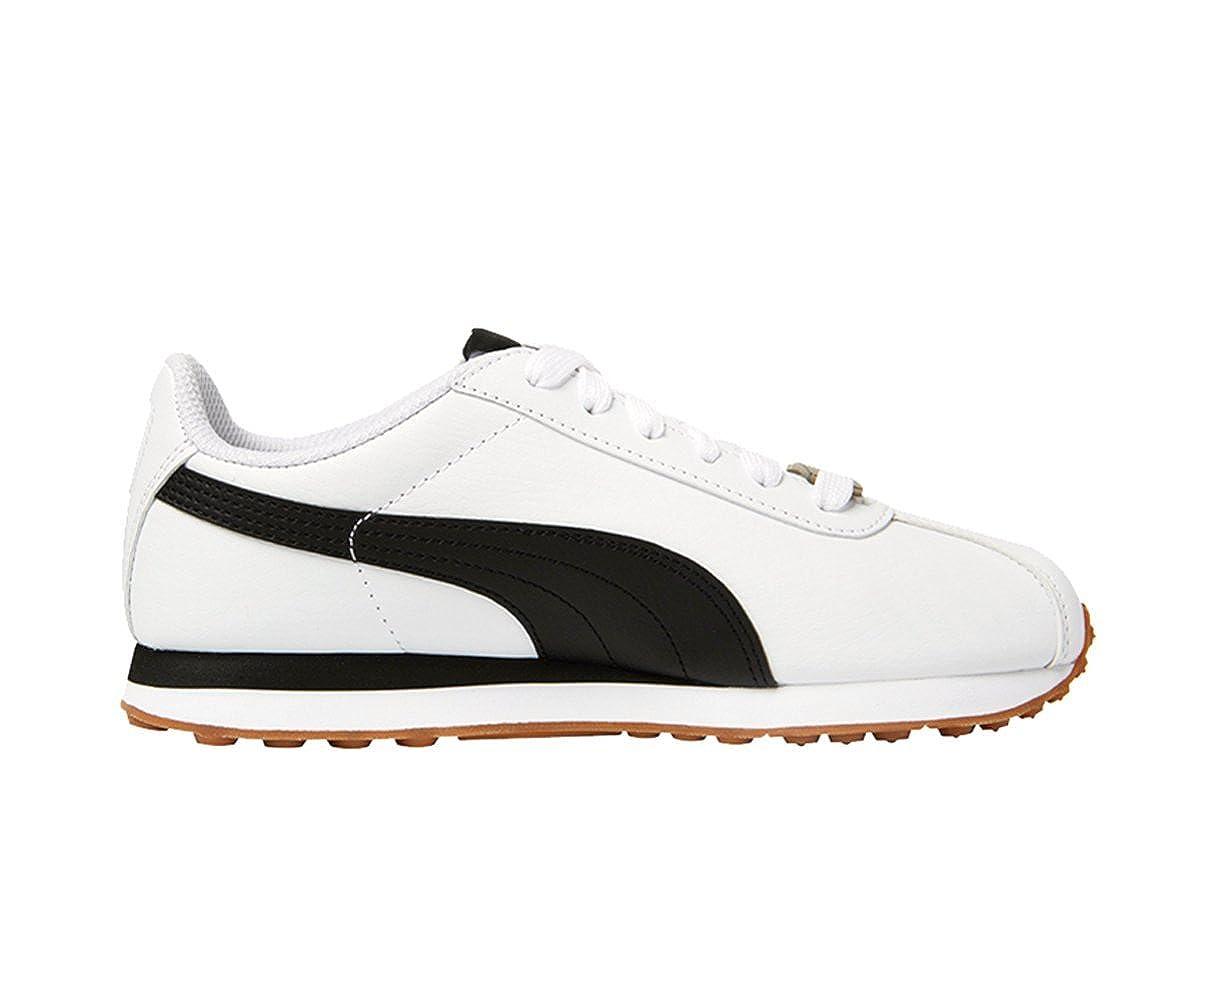 4d716408a23 Amazon.com  PUMA BTS x New Collaboration Turin BTS  Shoes